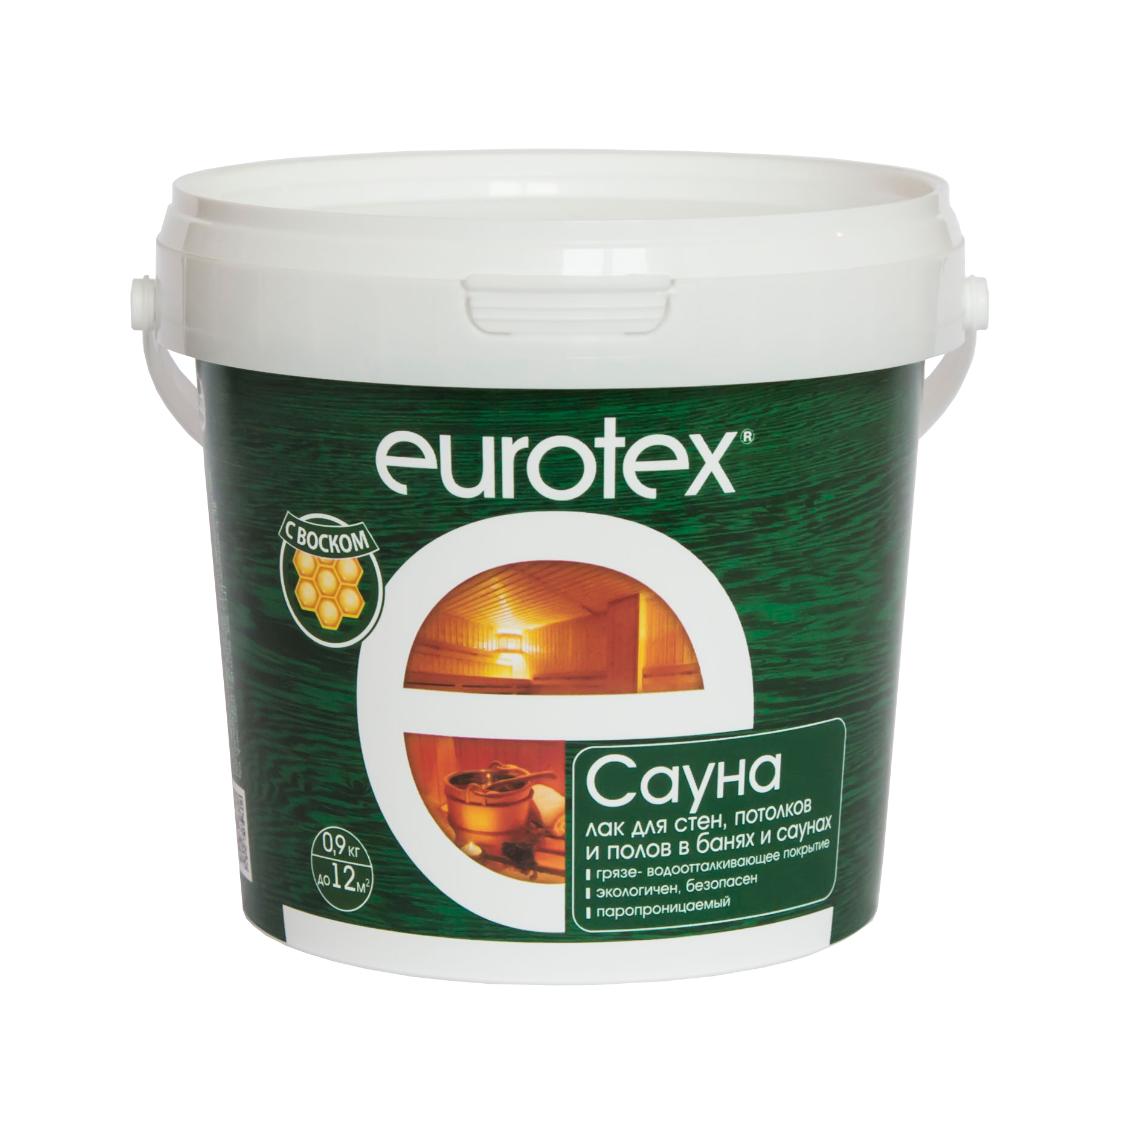 Eurotex-Сауна защитное покрытие 0,9кг